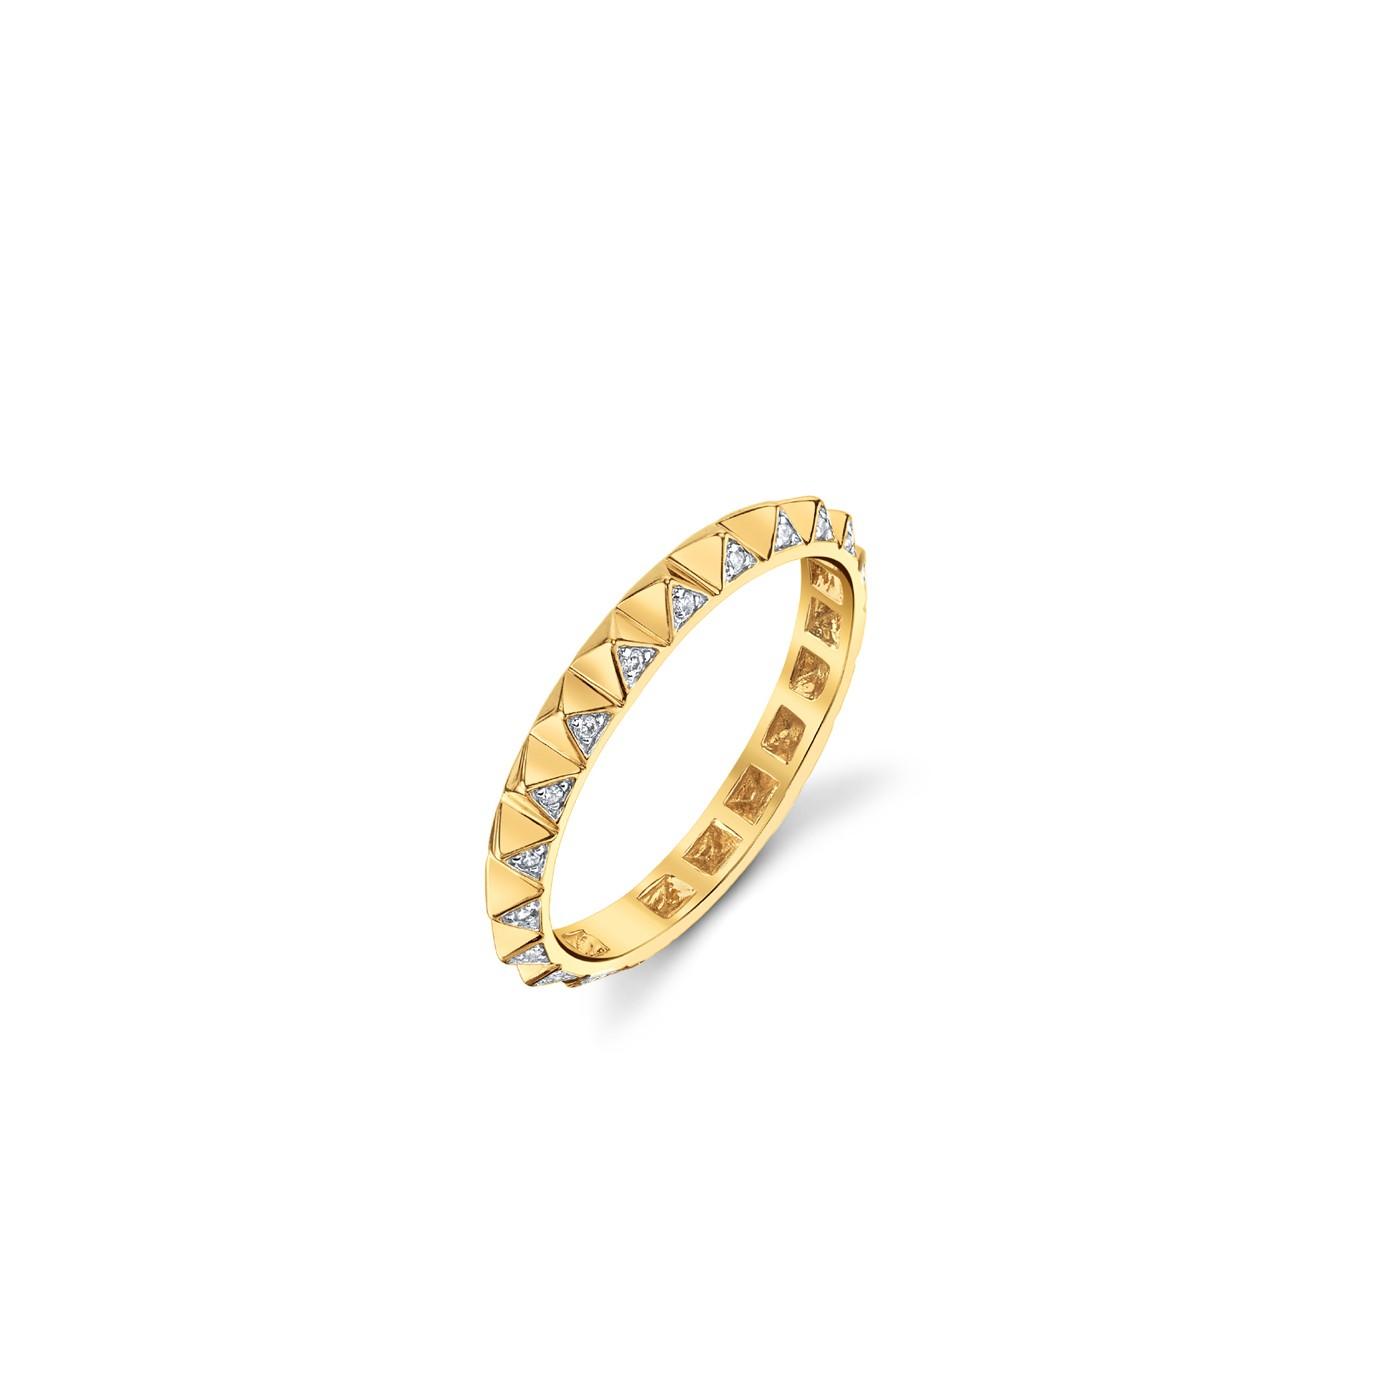 Gold & Diamond Mini Pyramid Ring, $640. Image via Sydney Evan